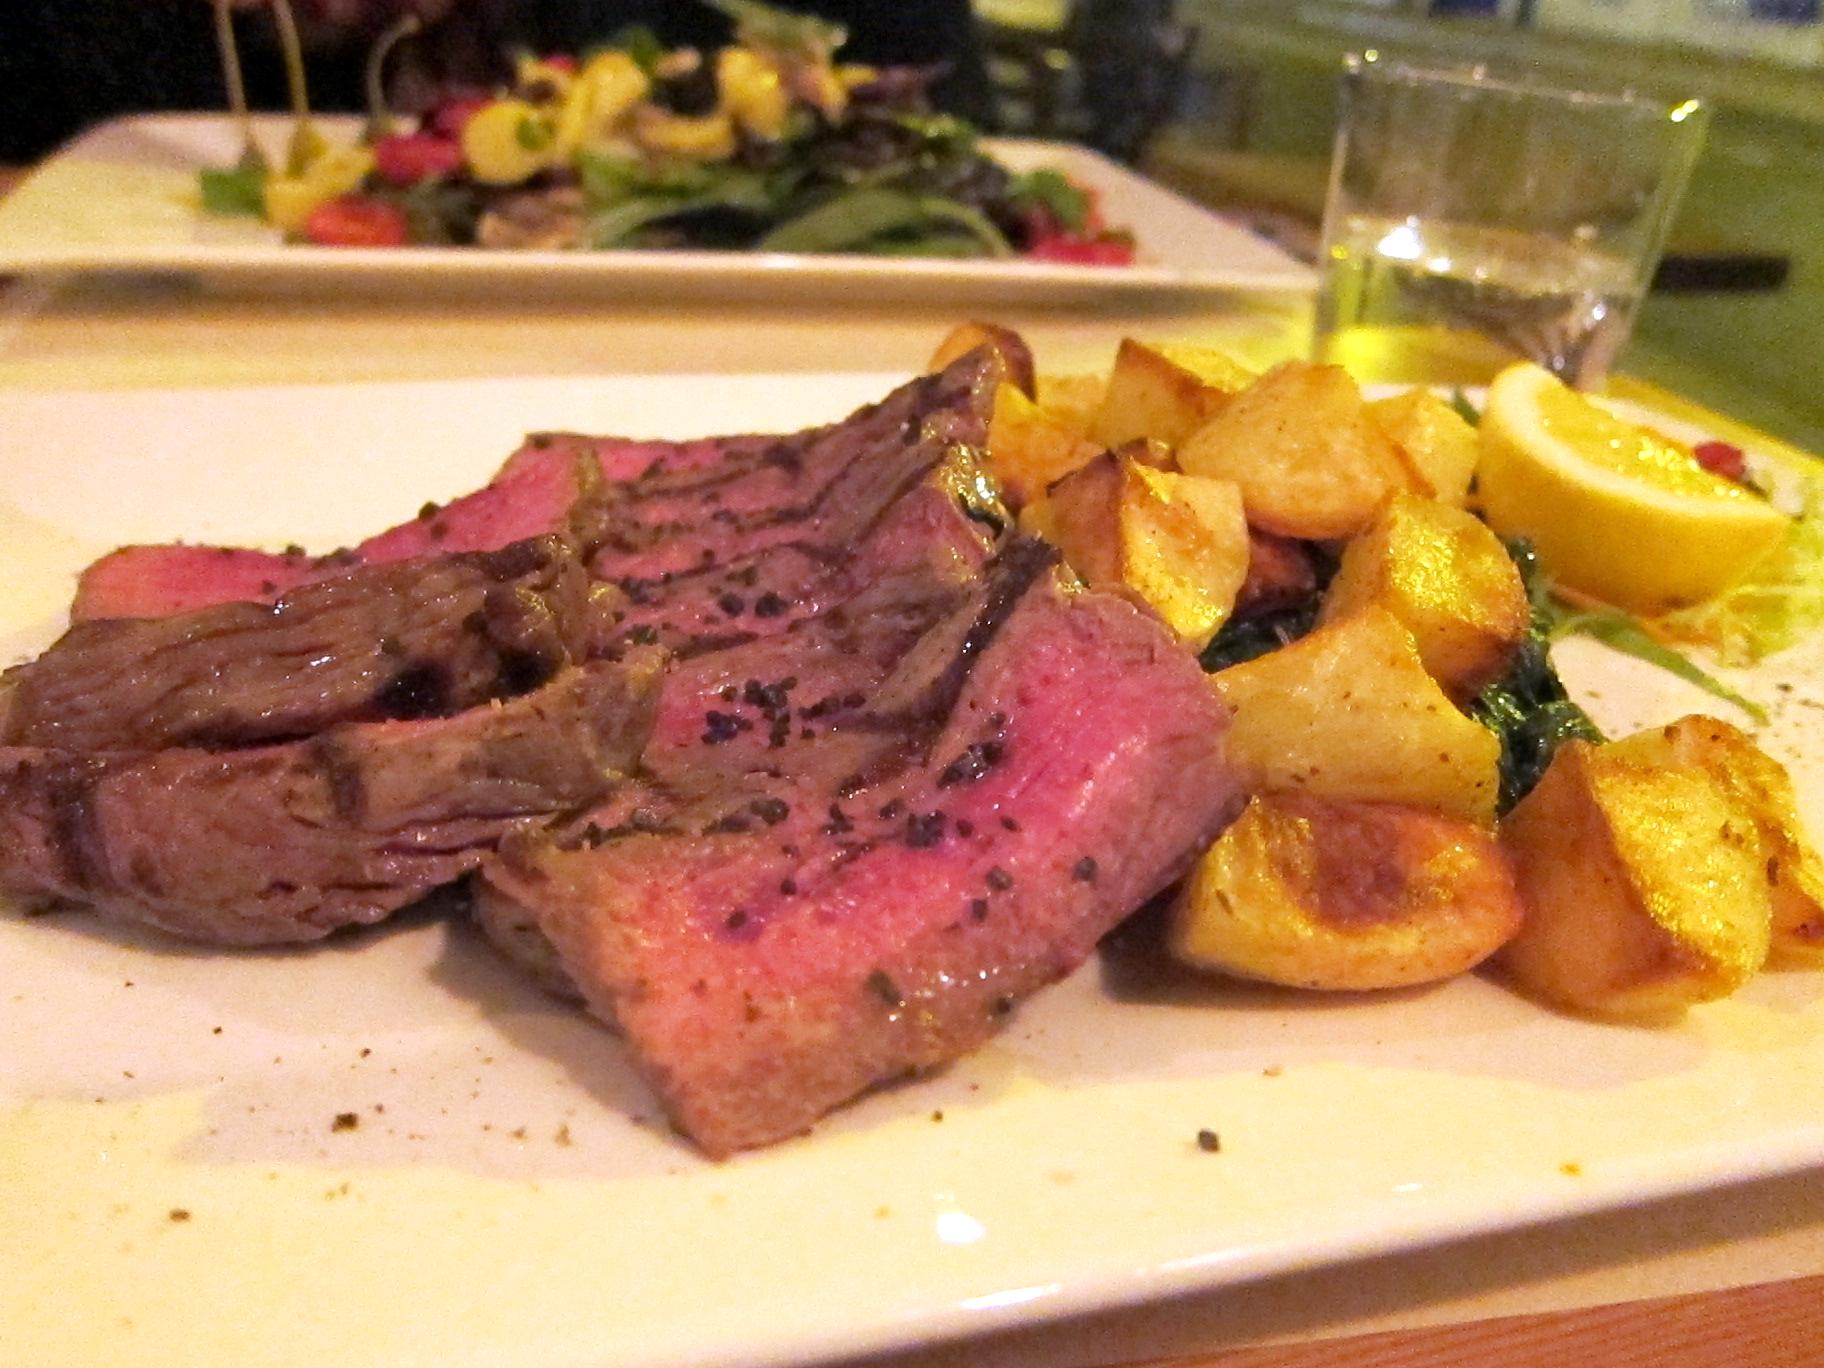 Qvintessenza steak